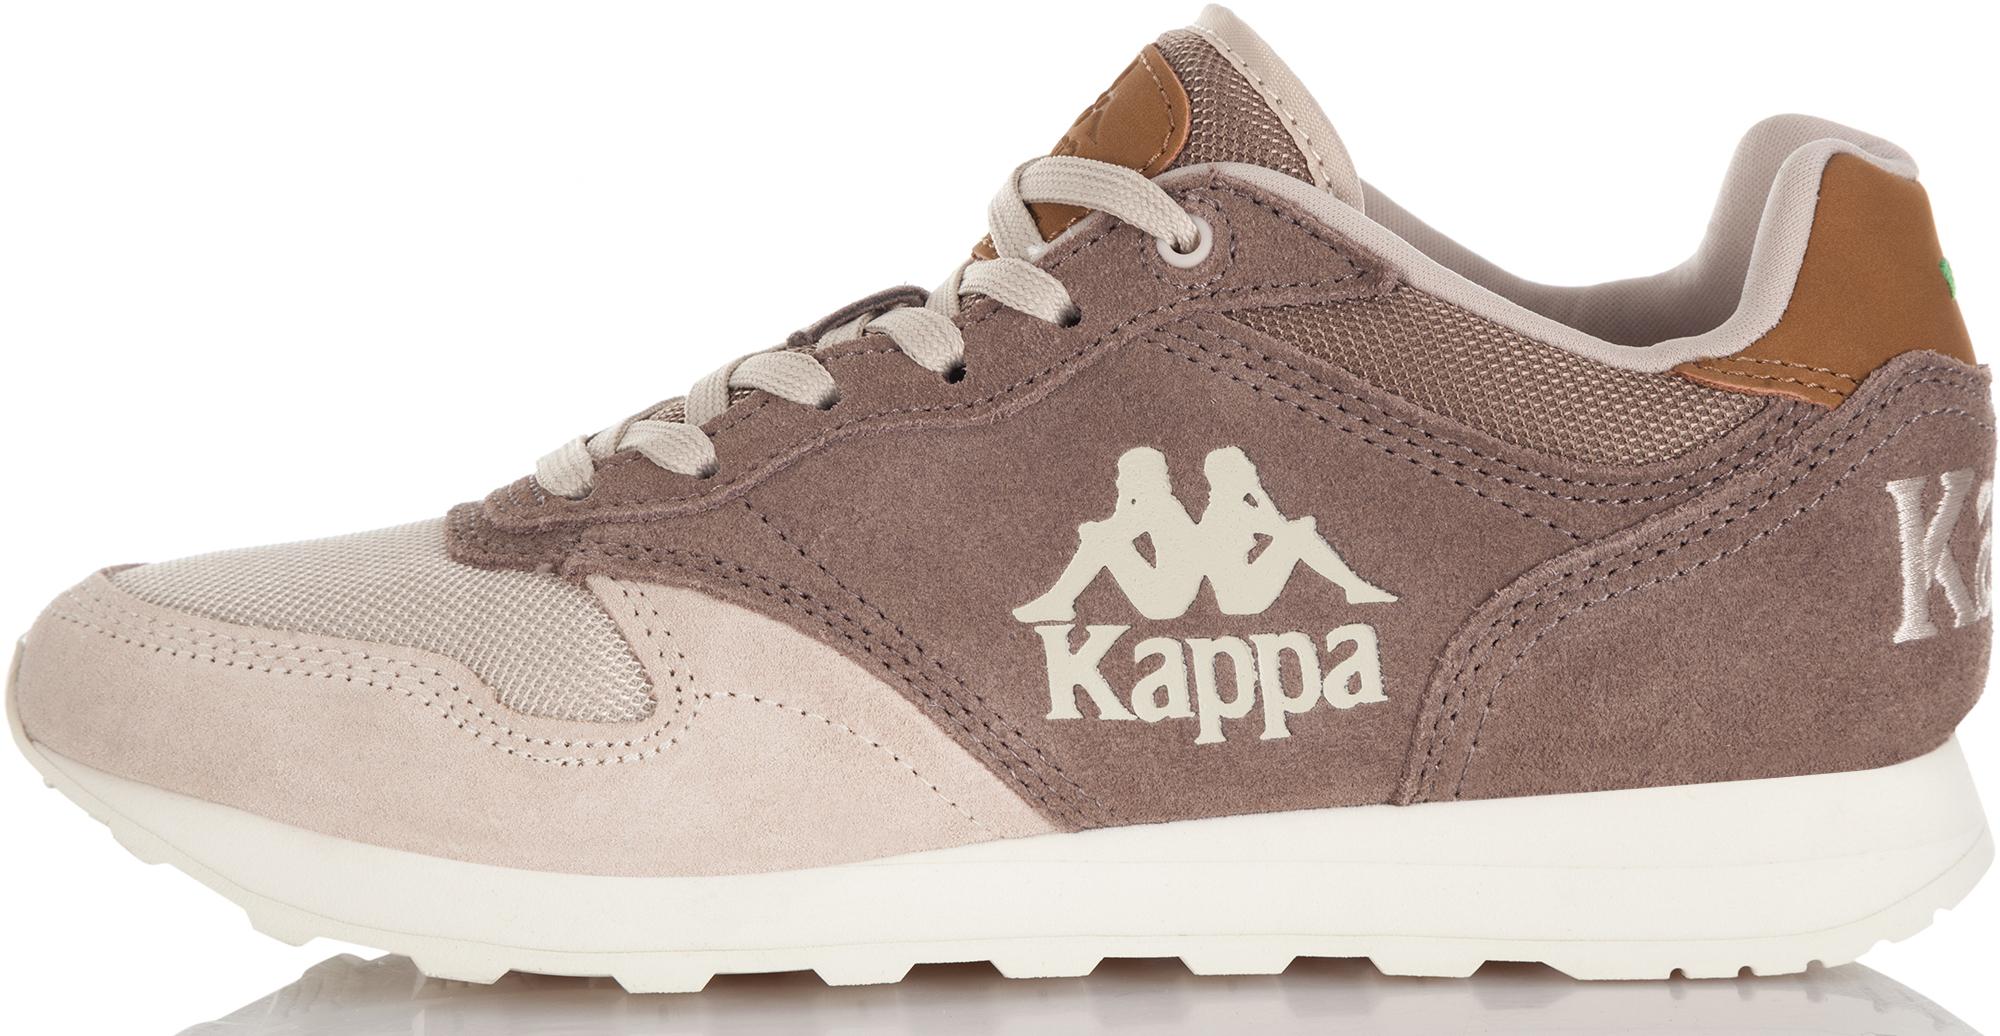 Kappa Кроссовки женские Kappa Authentic Run, размер 41 b1c095e8ec0